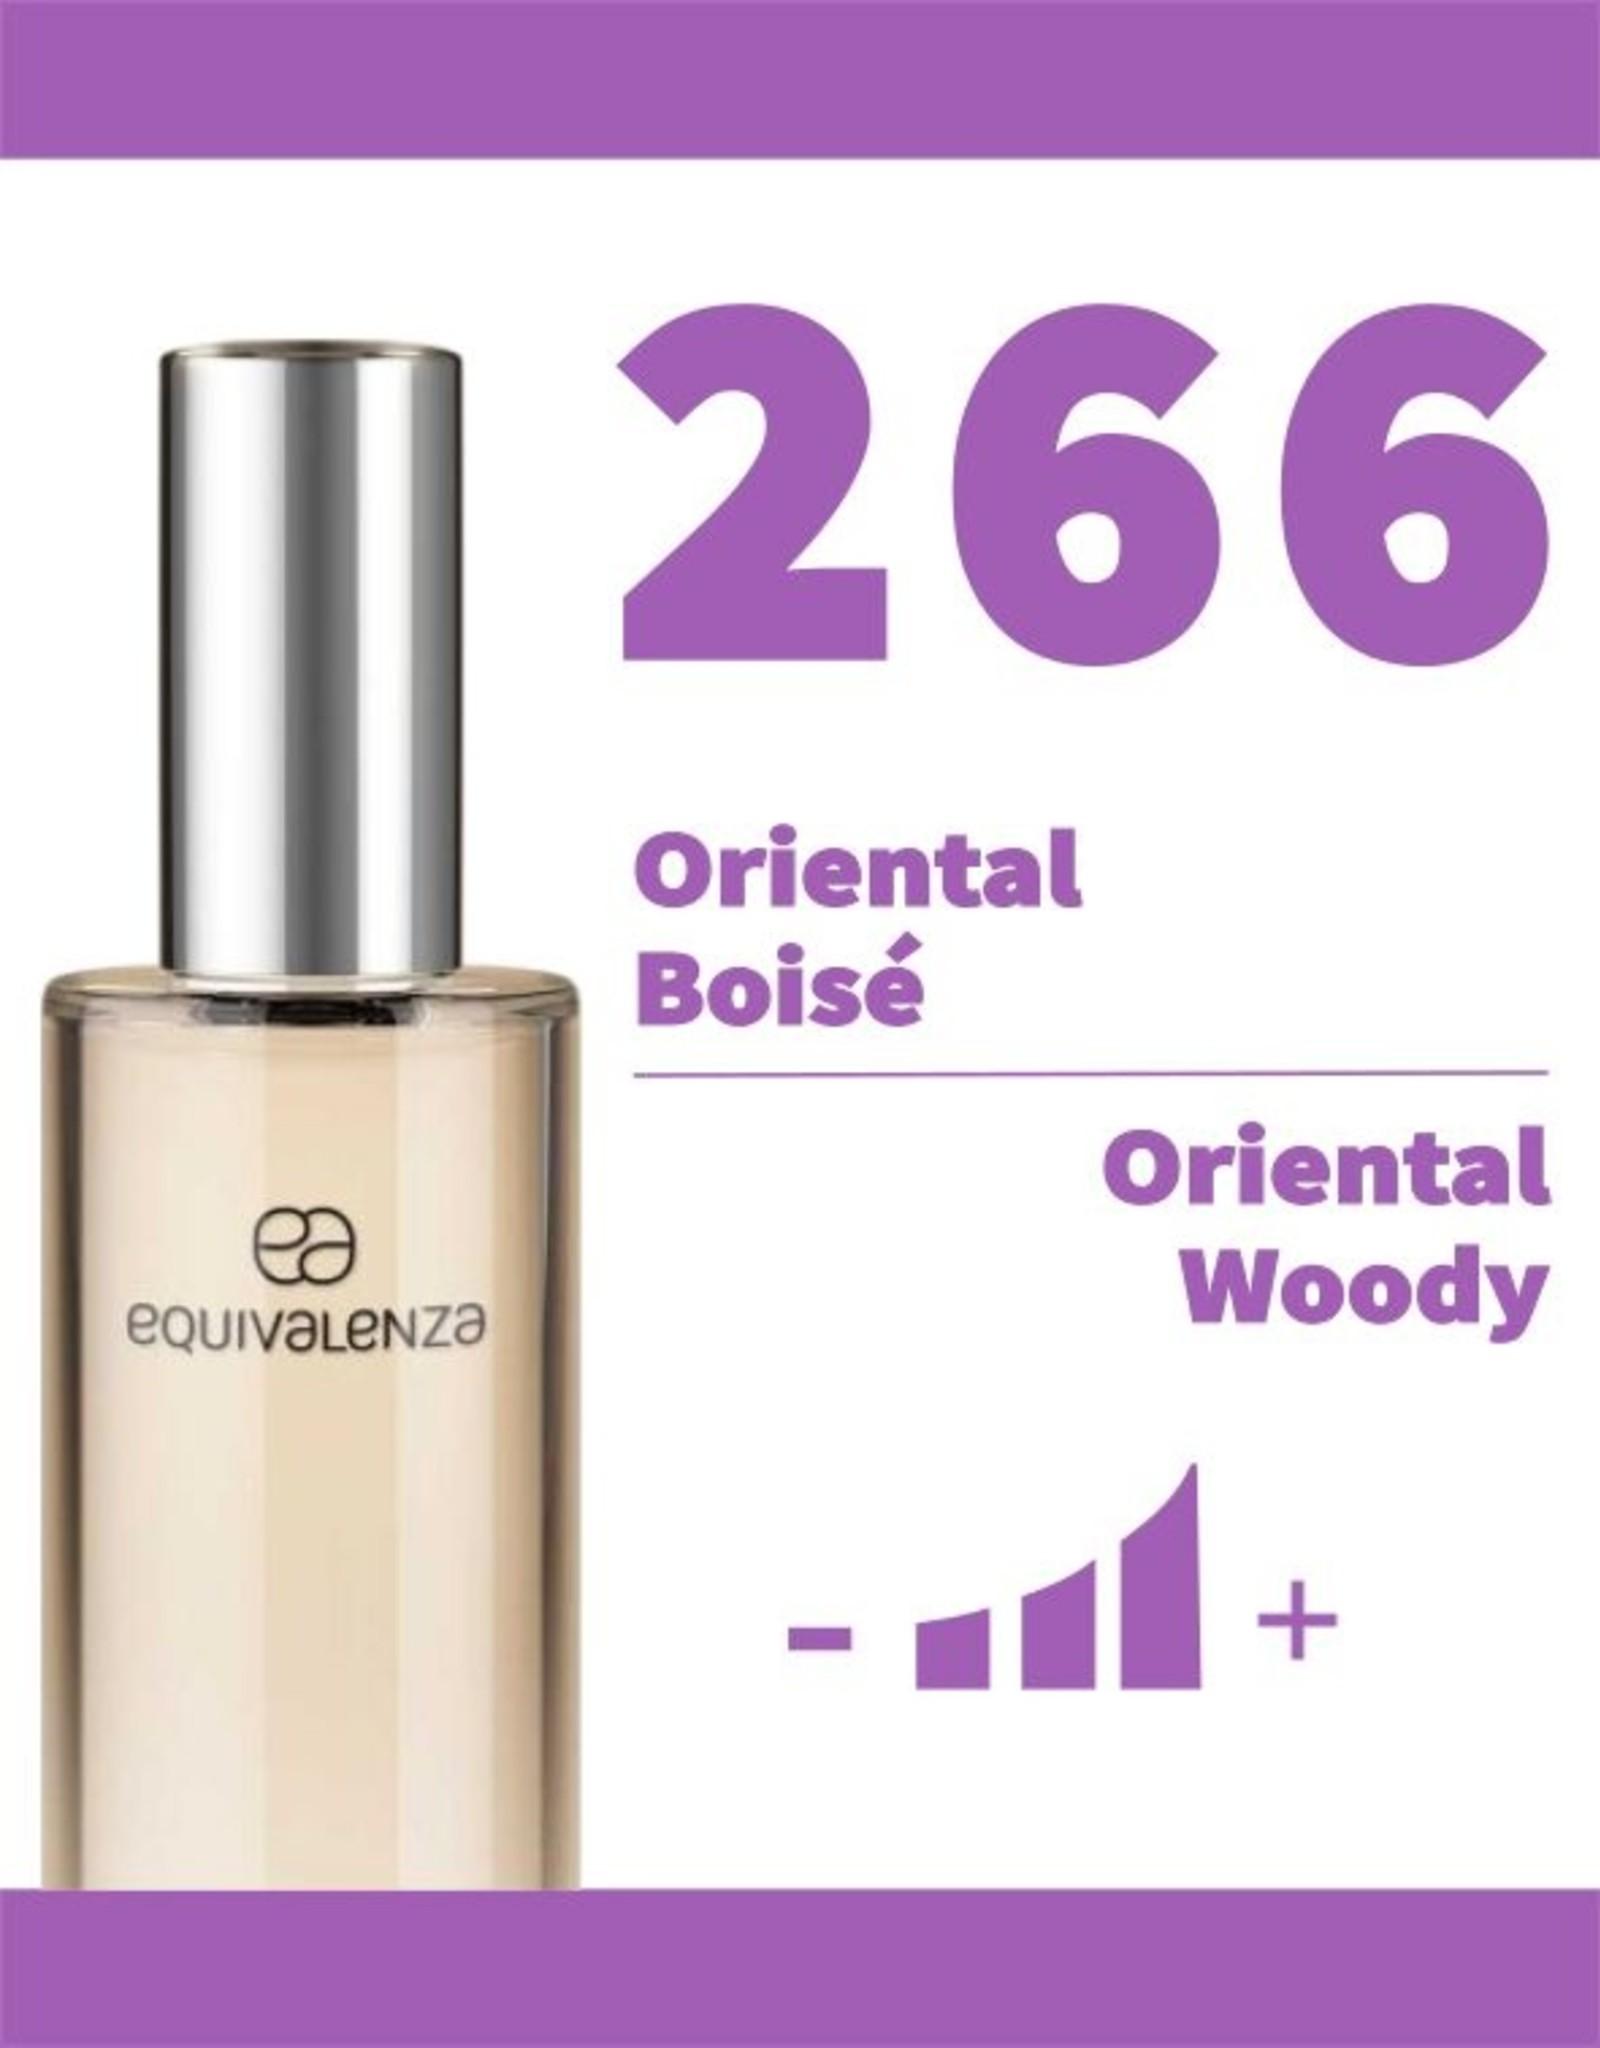 Equivalenza Oriental Woody 266